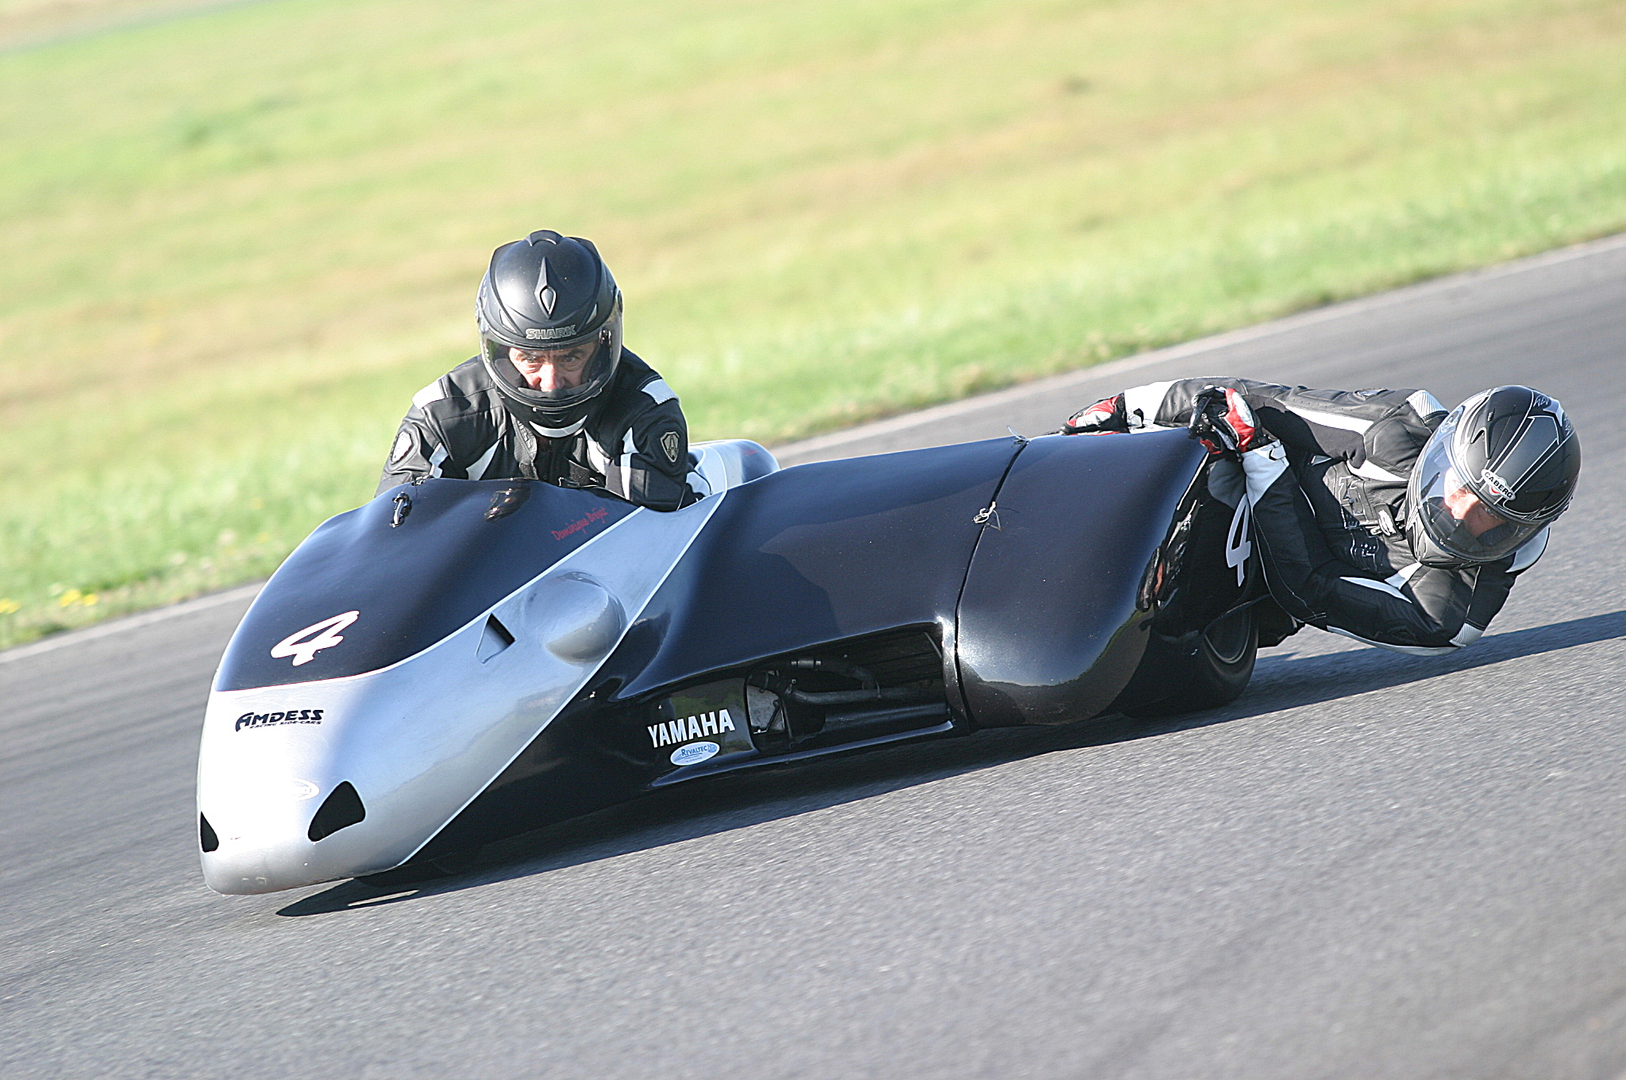 Banshee Superstore Tony Doukas Racing - Banshee Superstore Tony